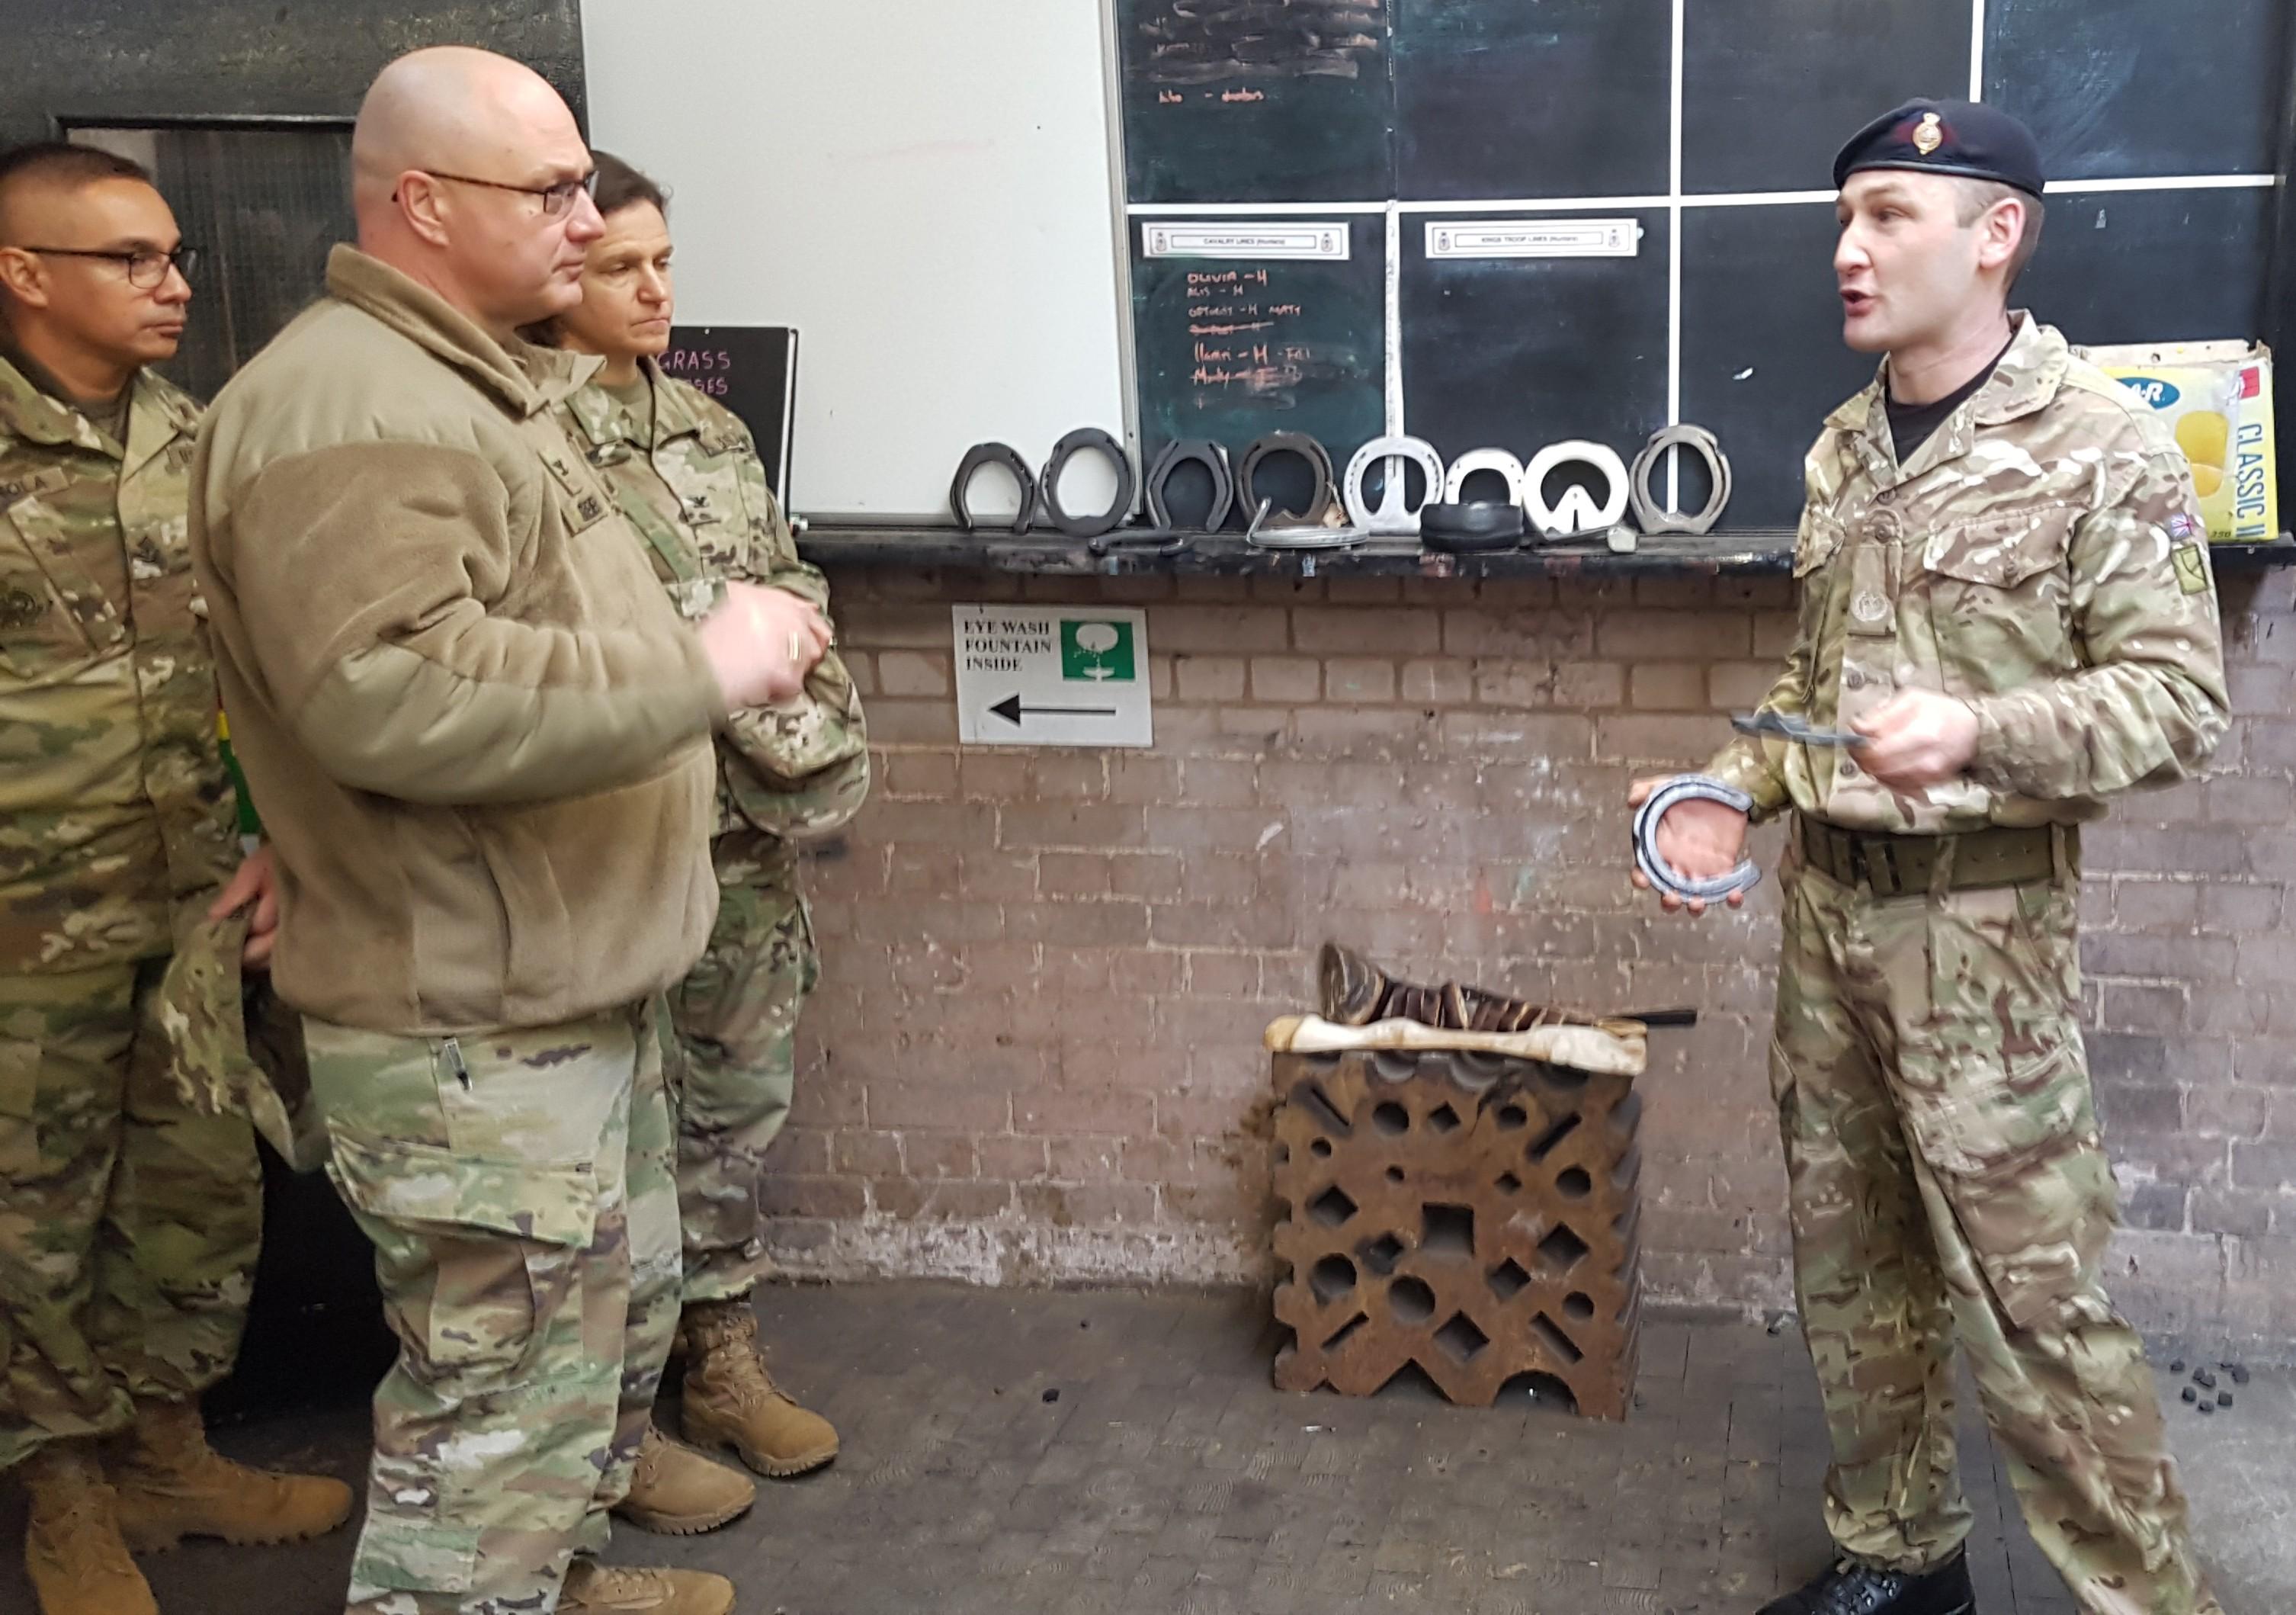 army vet technician